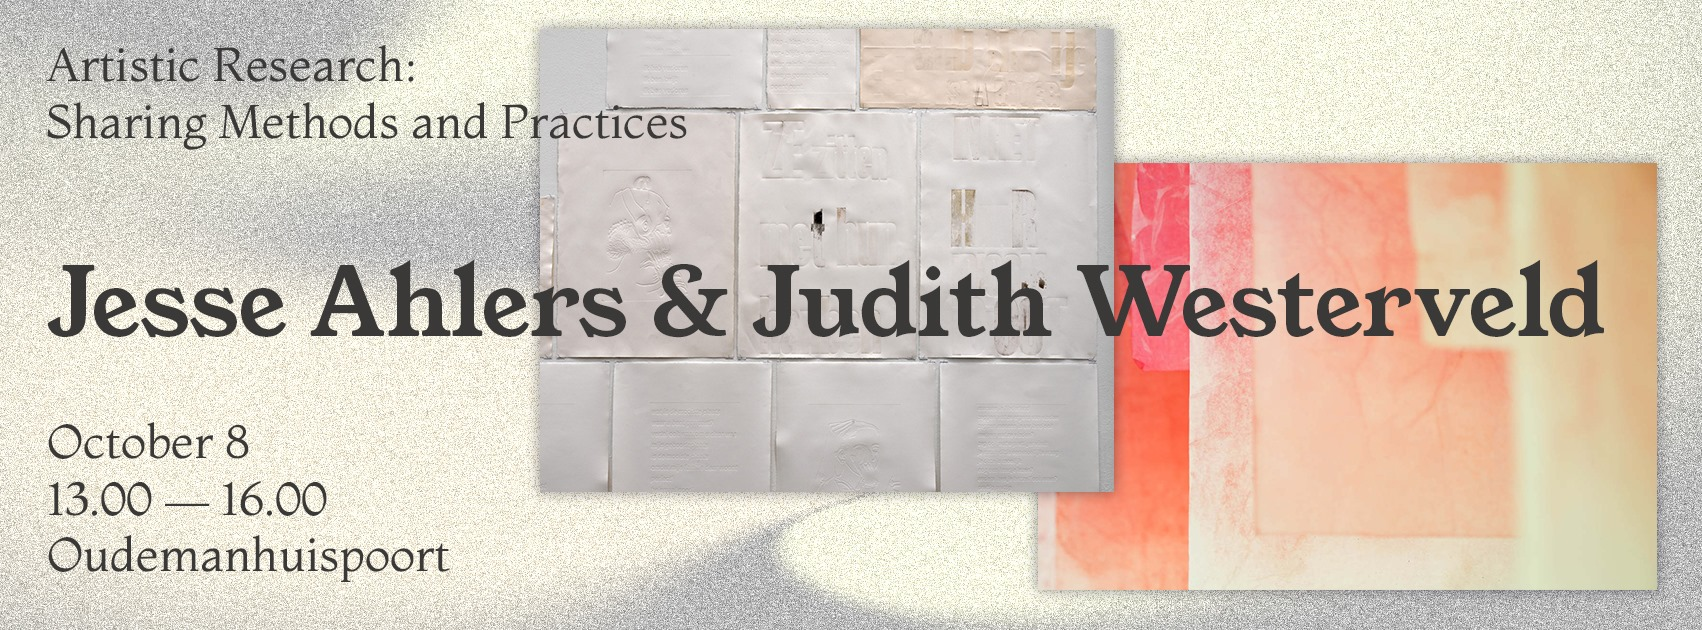 ARRG: Jesse Ahlers and Judith Westerveld